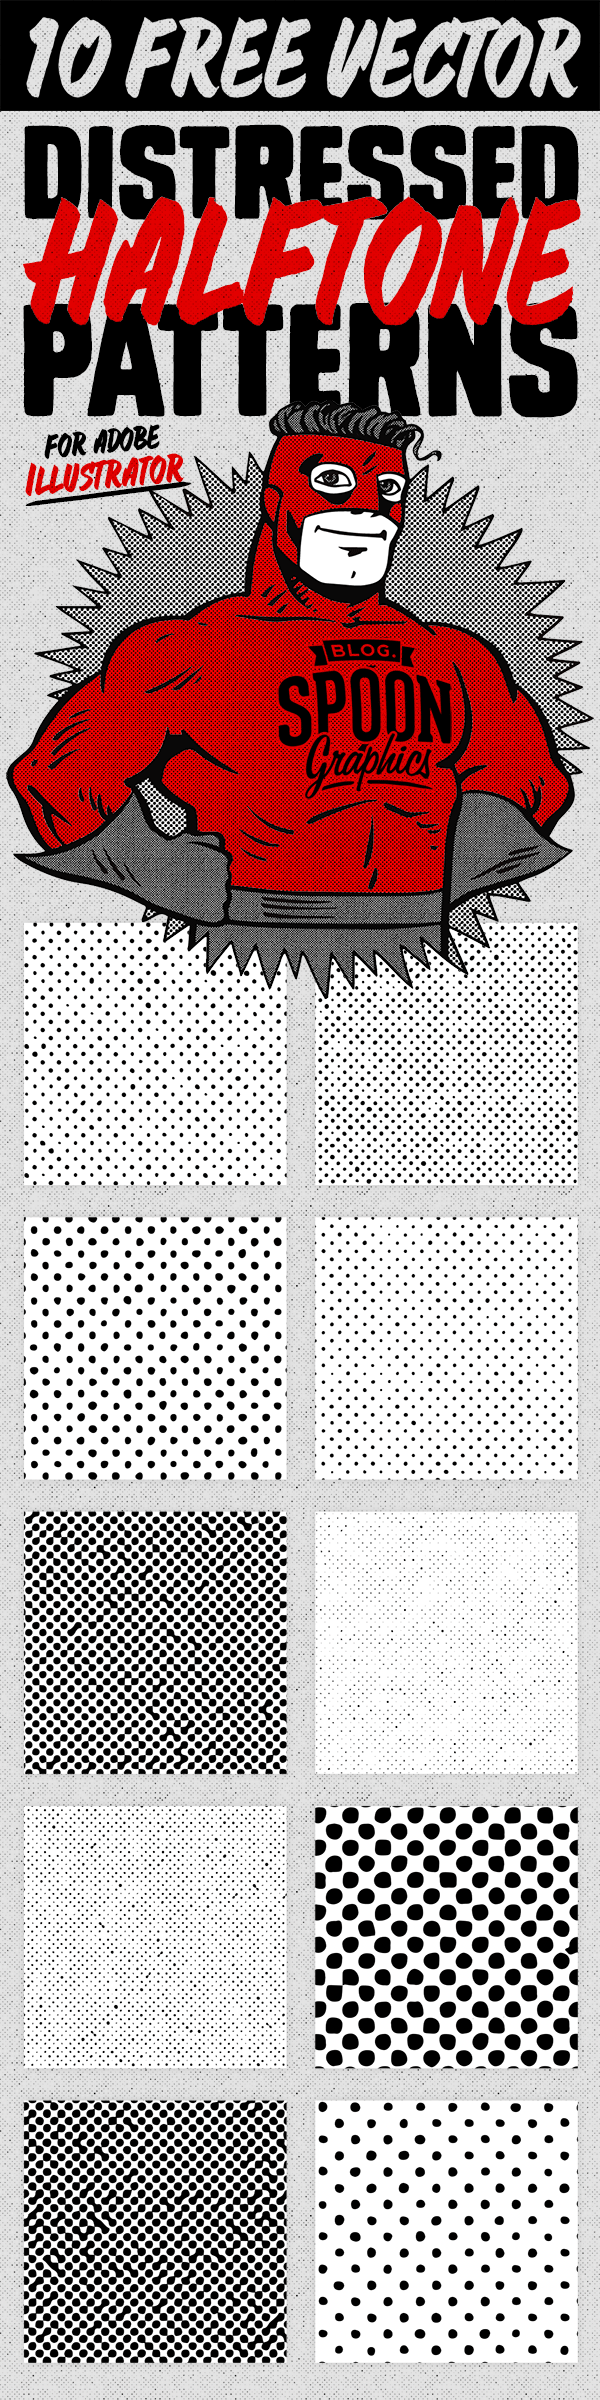 10 Distressed Vector Halftone Patterns for Illustrator | Adobe ...